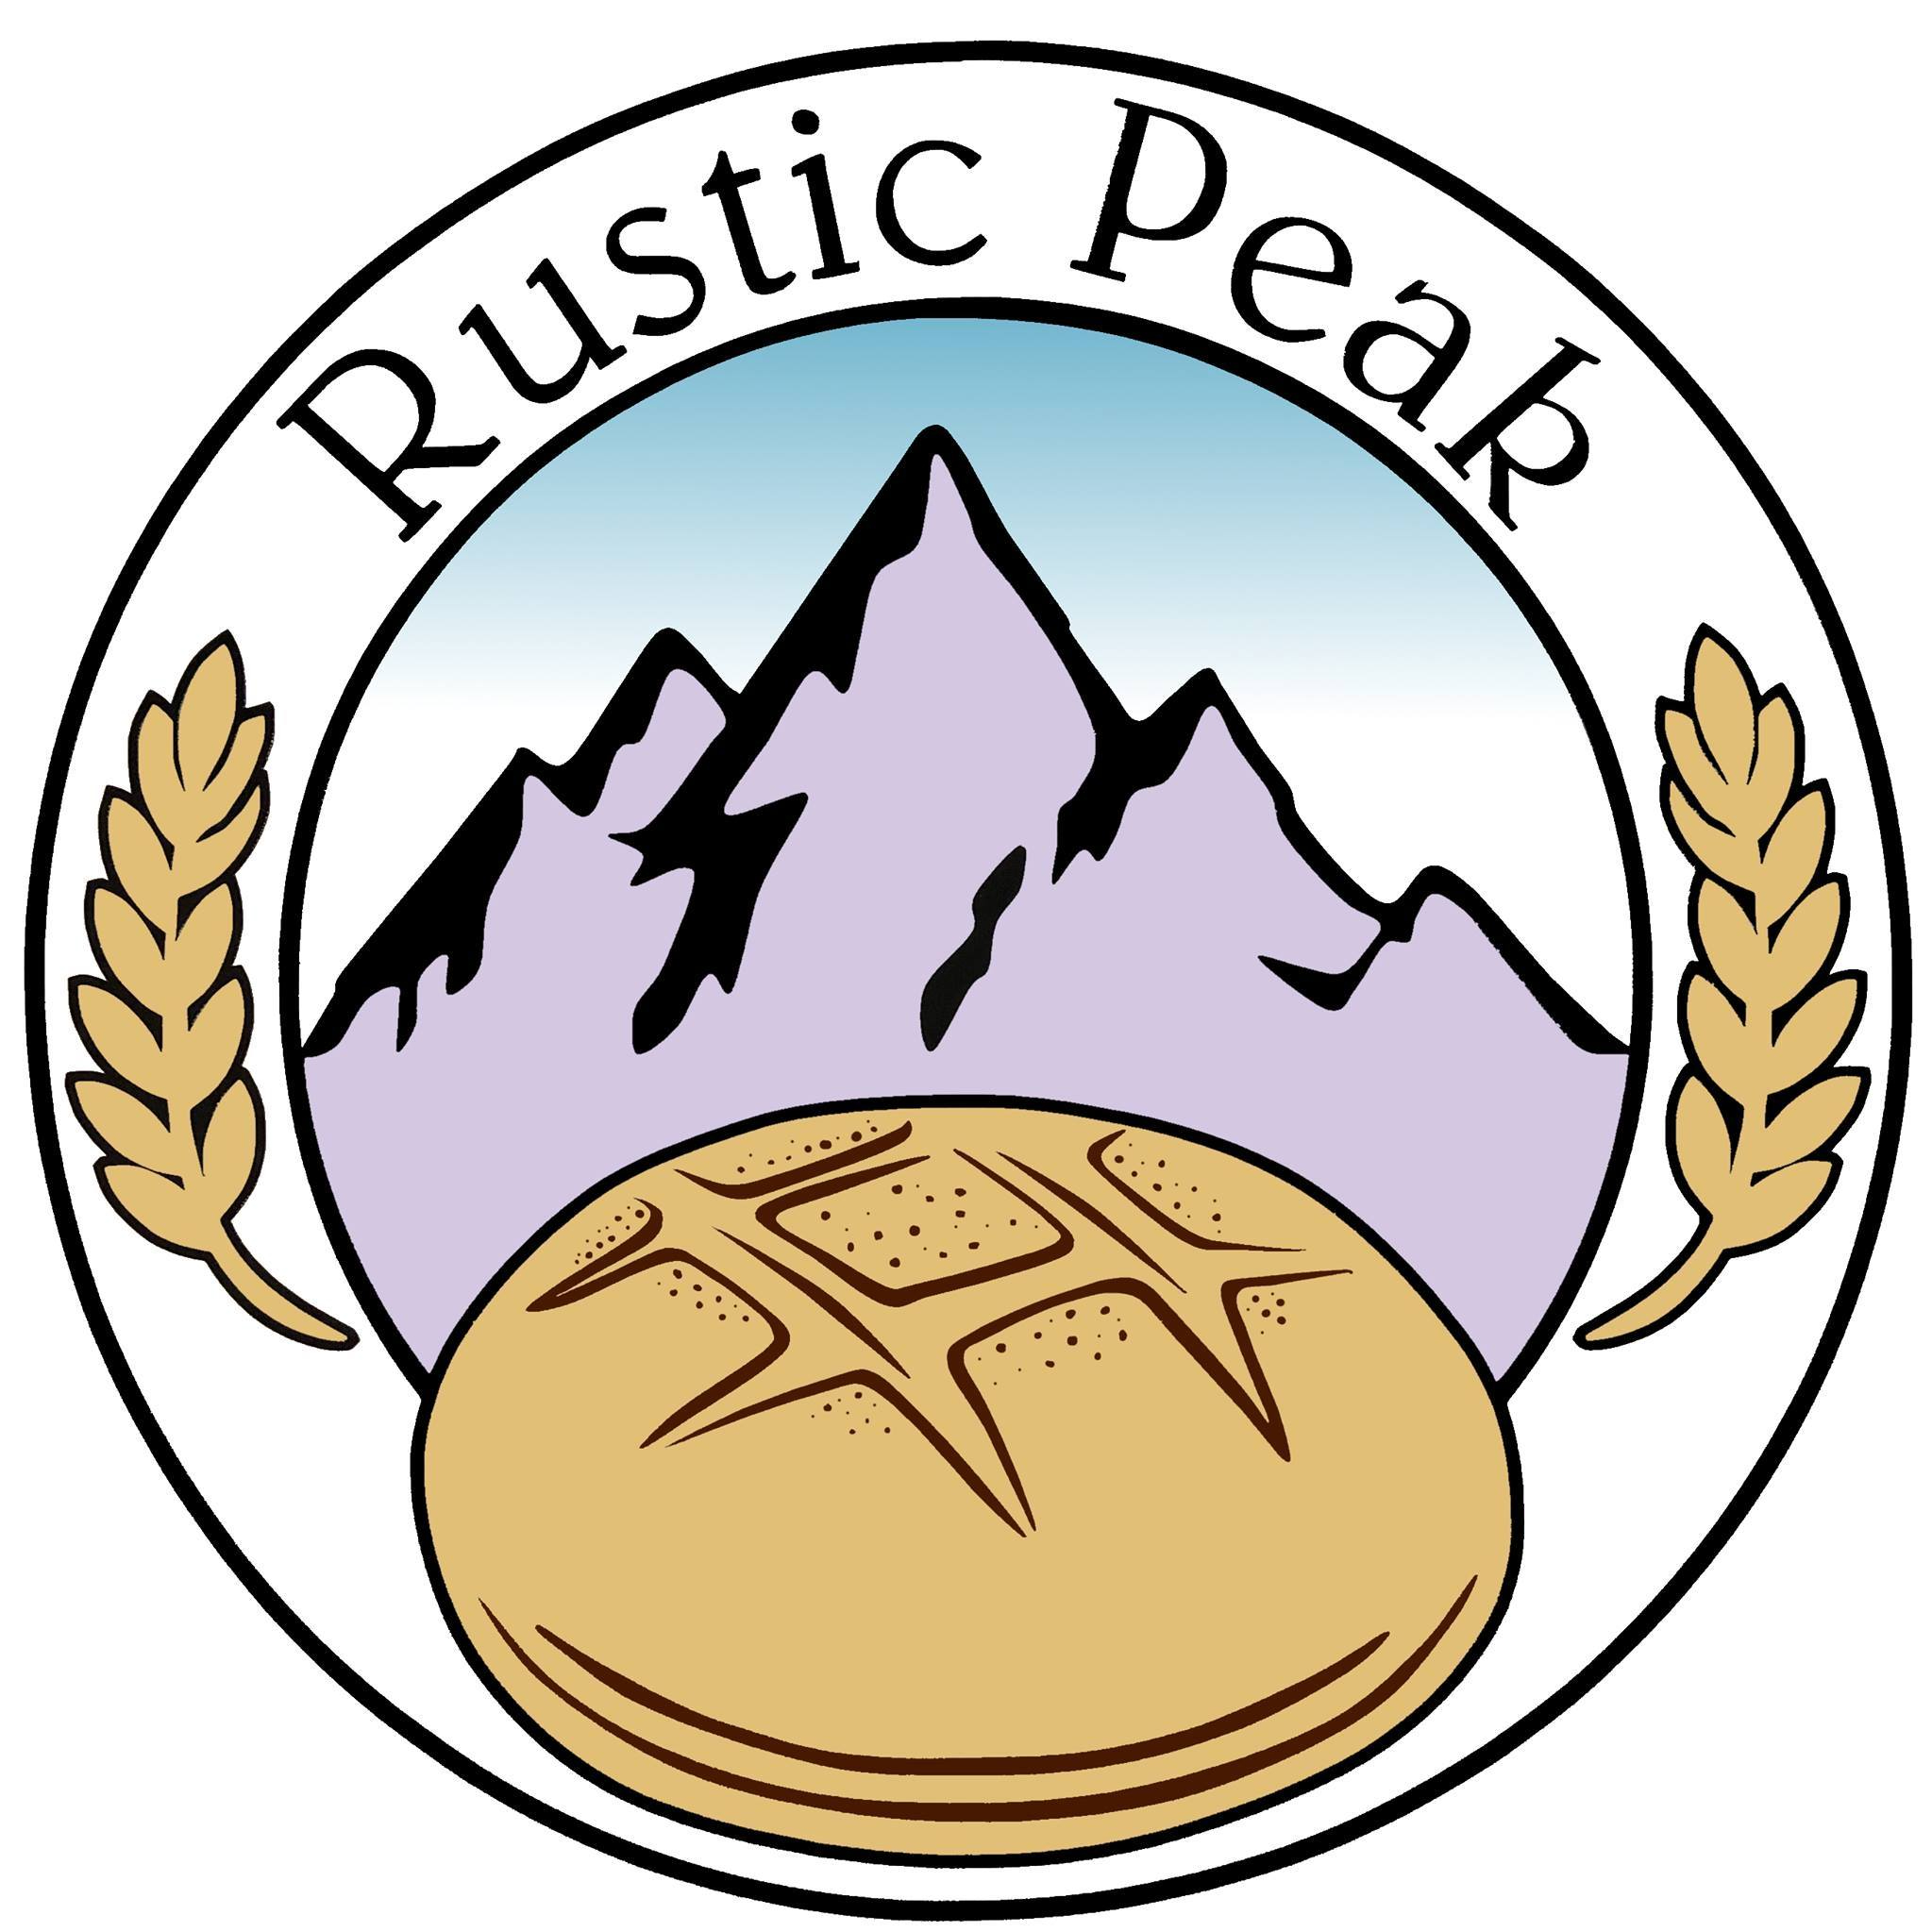 Rustic Peak Sourdough